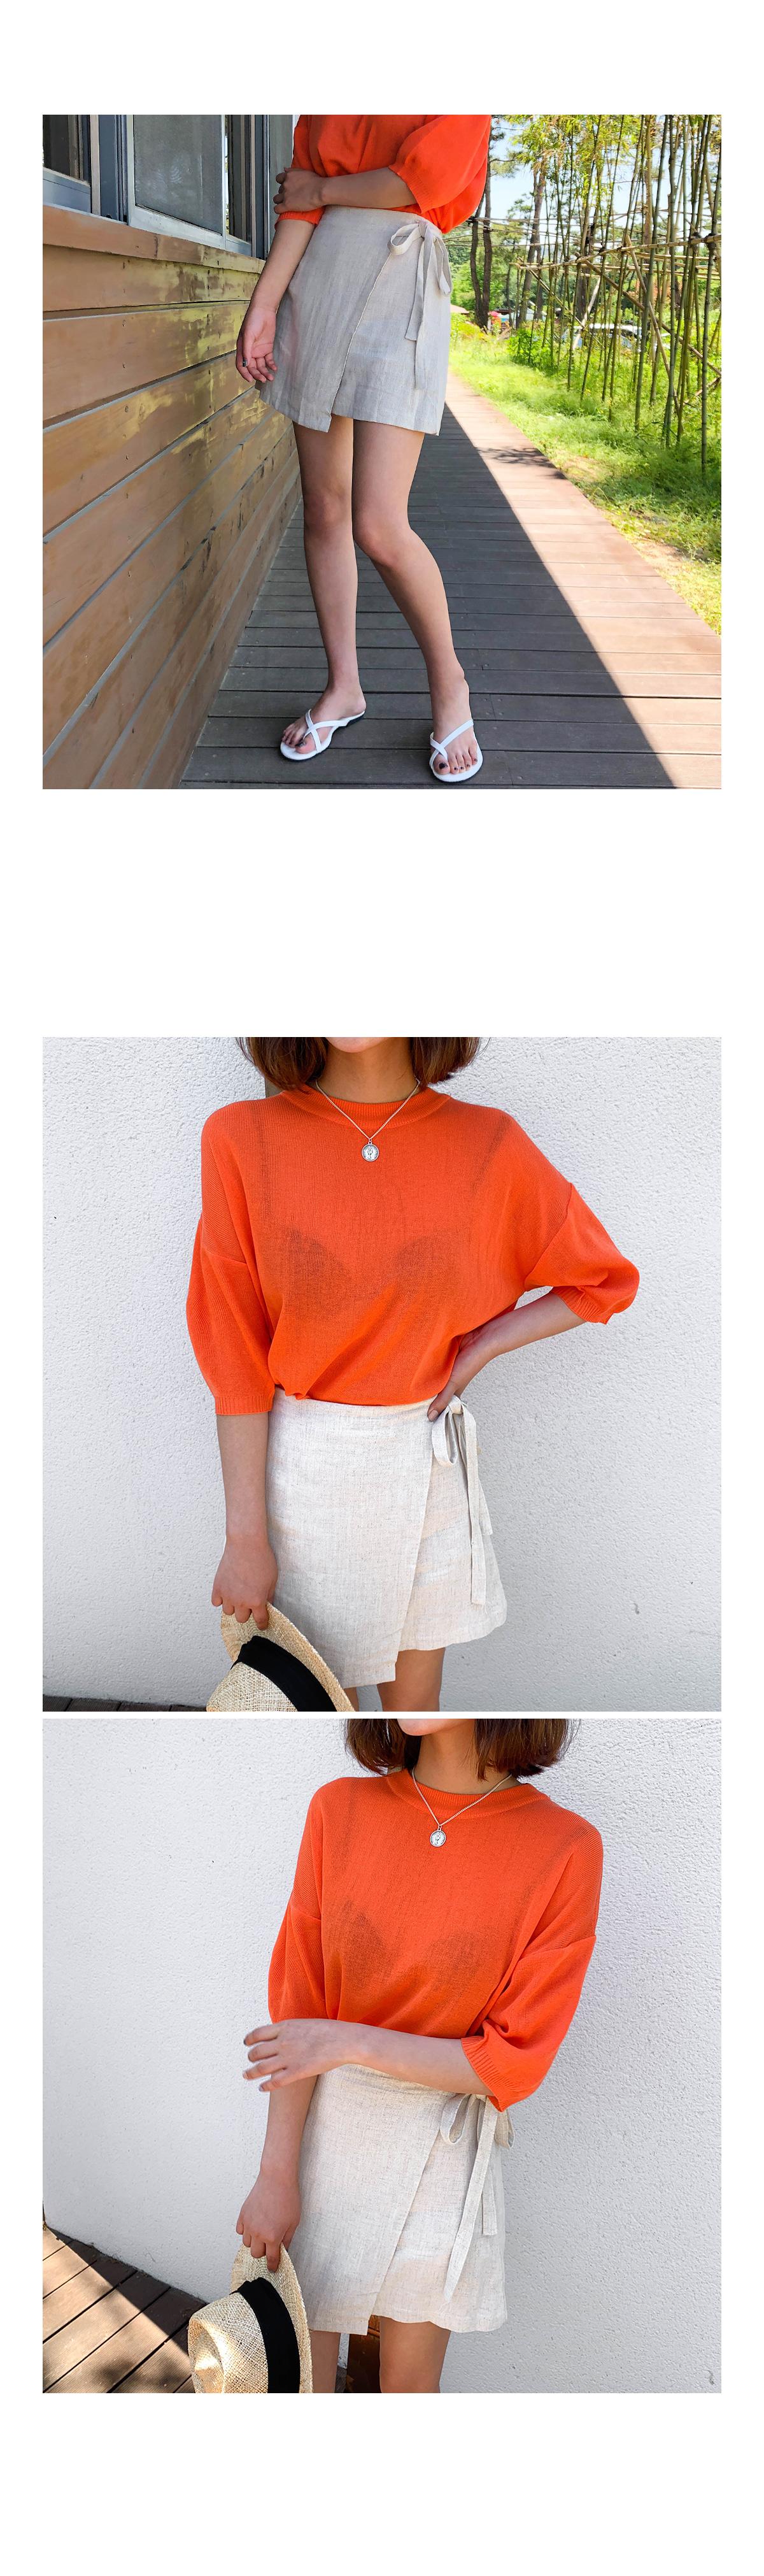 Linen lunn lab mini skirt